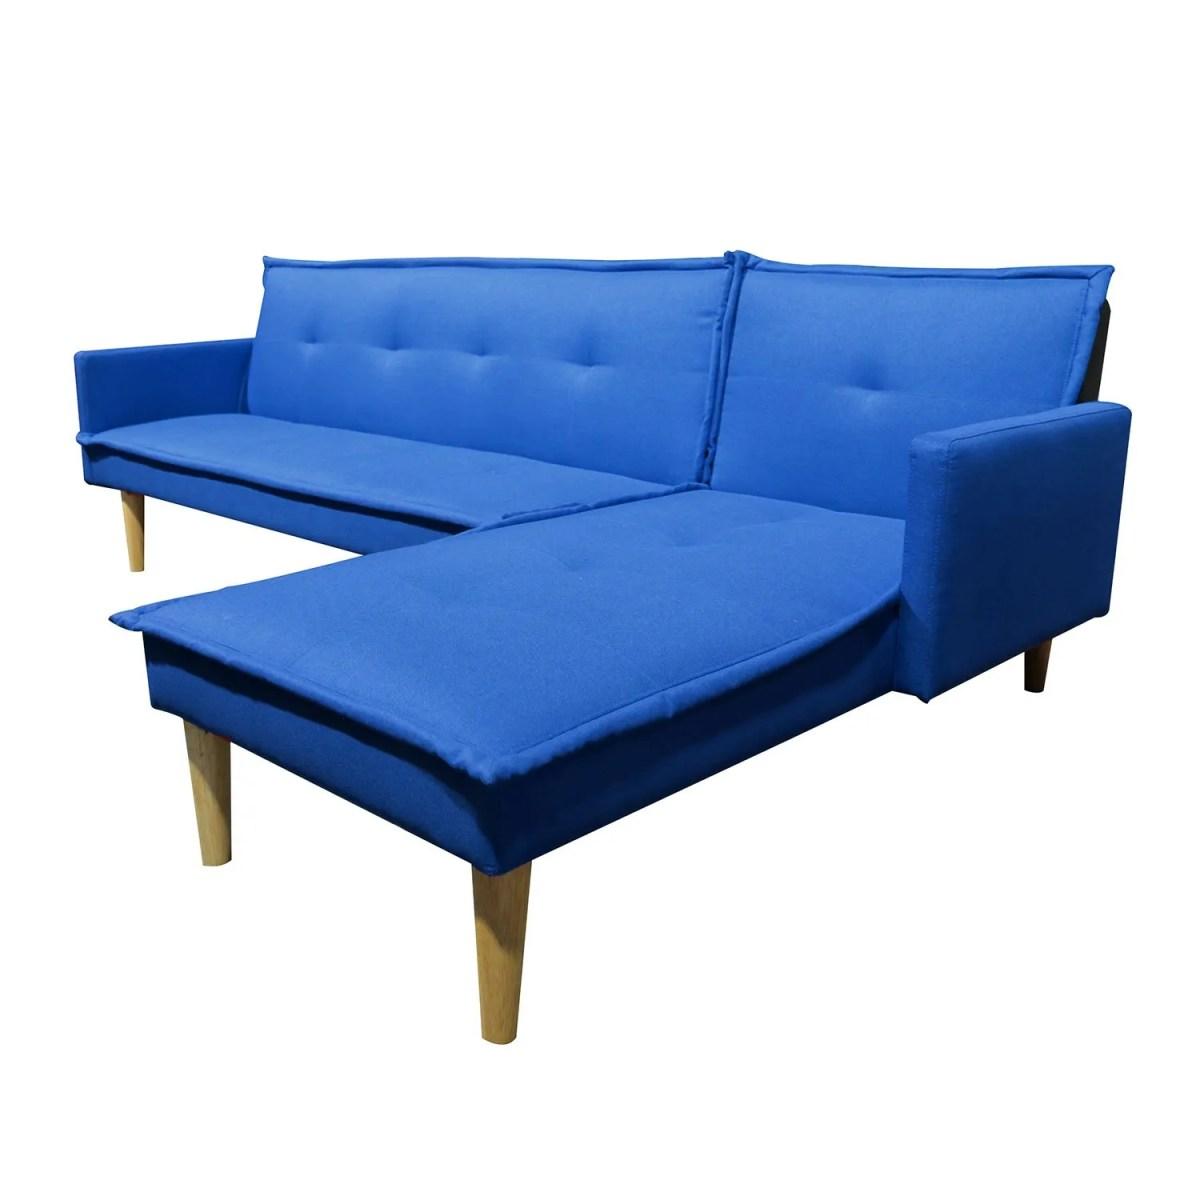 sala esquinada sofá cama independencia azul 1